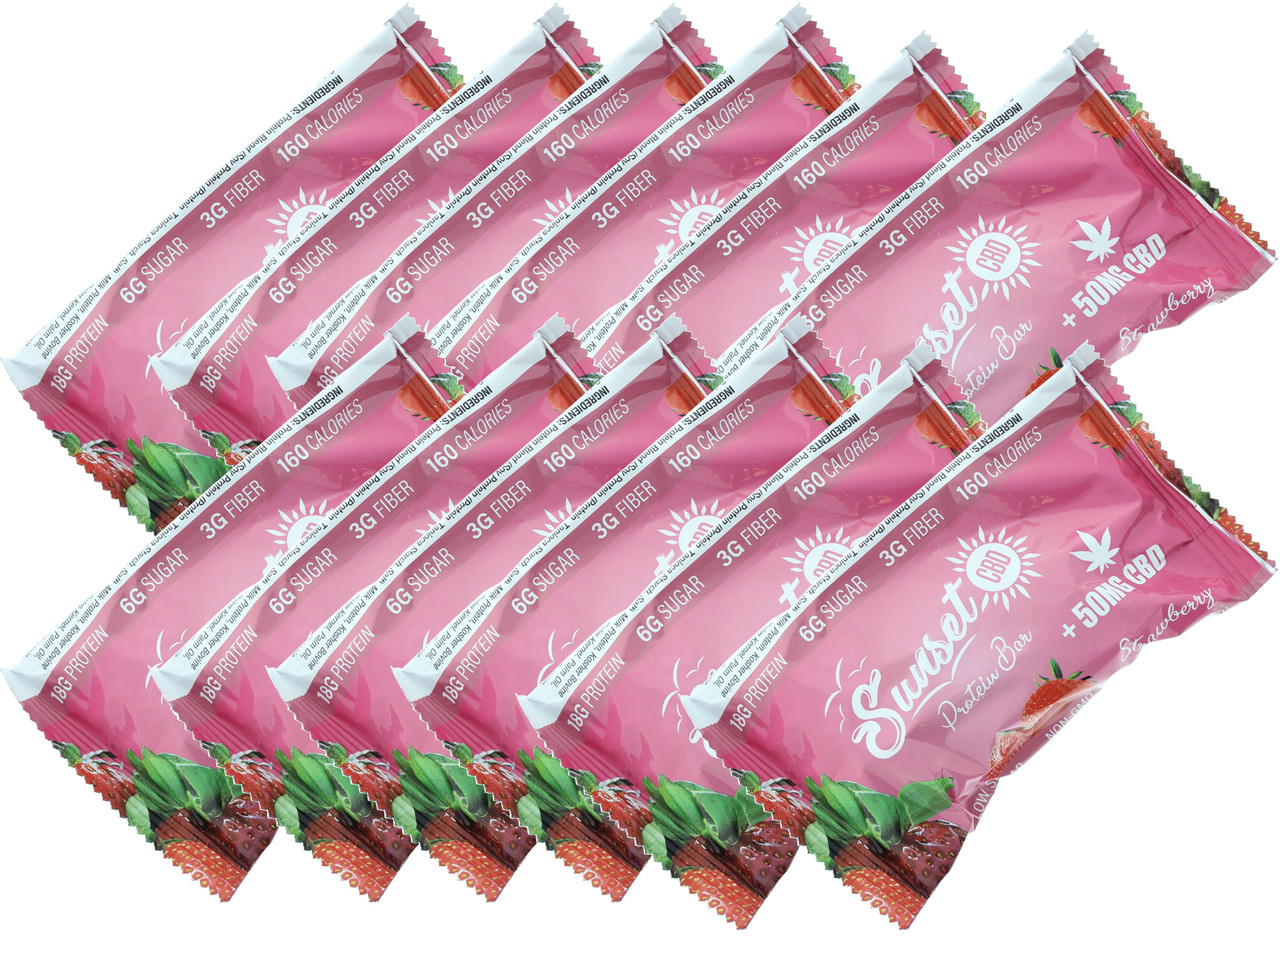 Natural Paradise 50mg CBD Protein Bars Strawberry